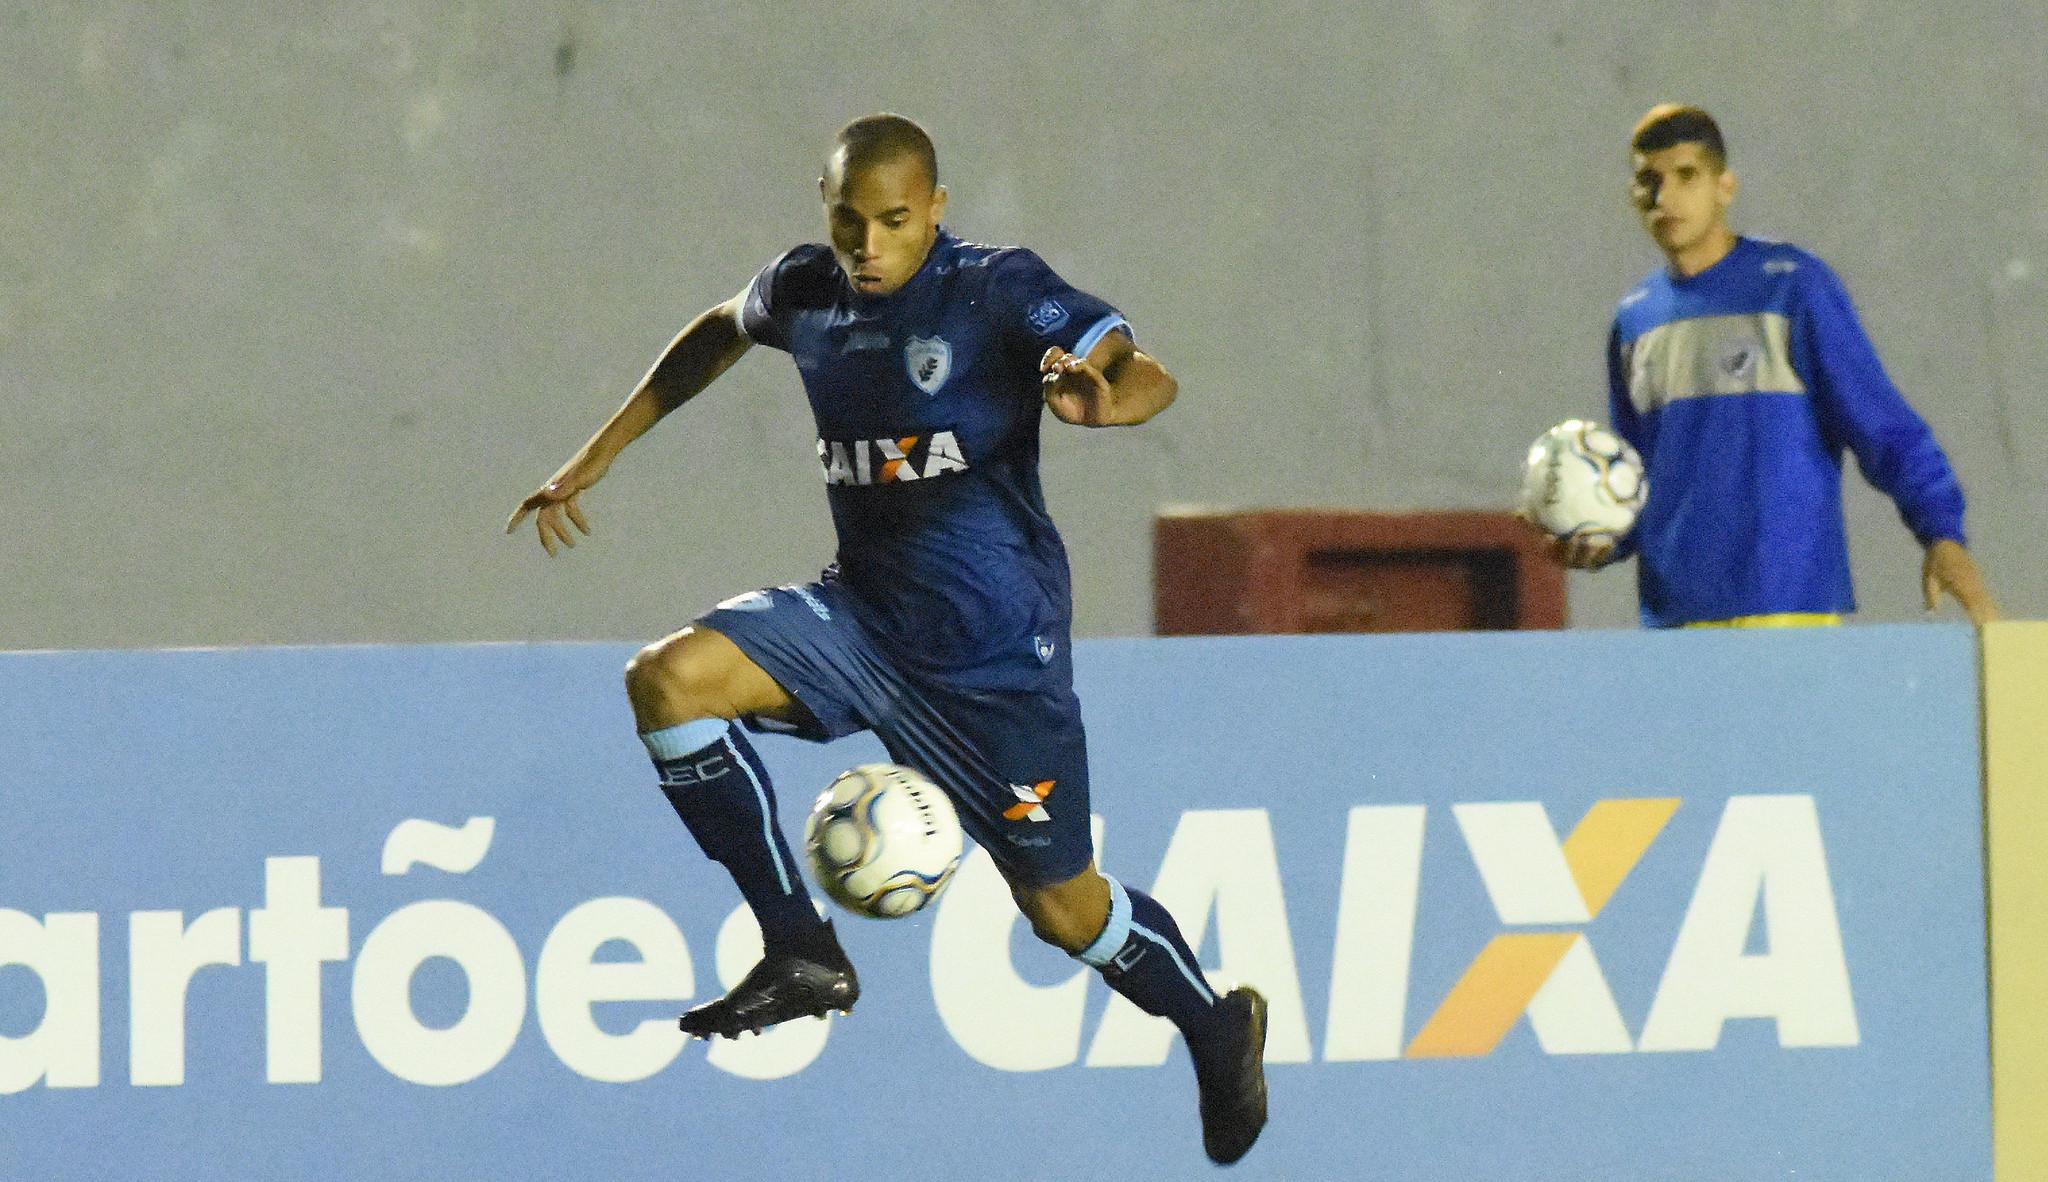 Foto: Gustavo Oliveira/Londrina Esporte Clube